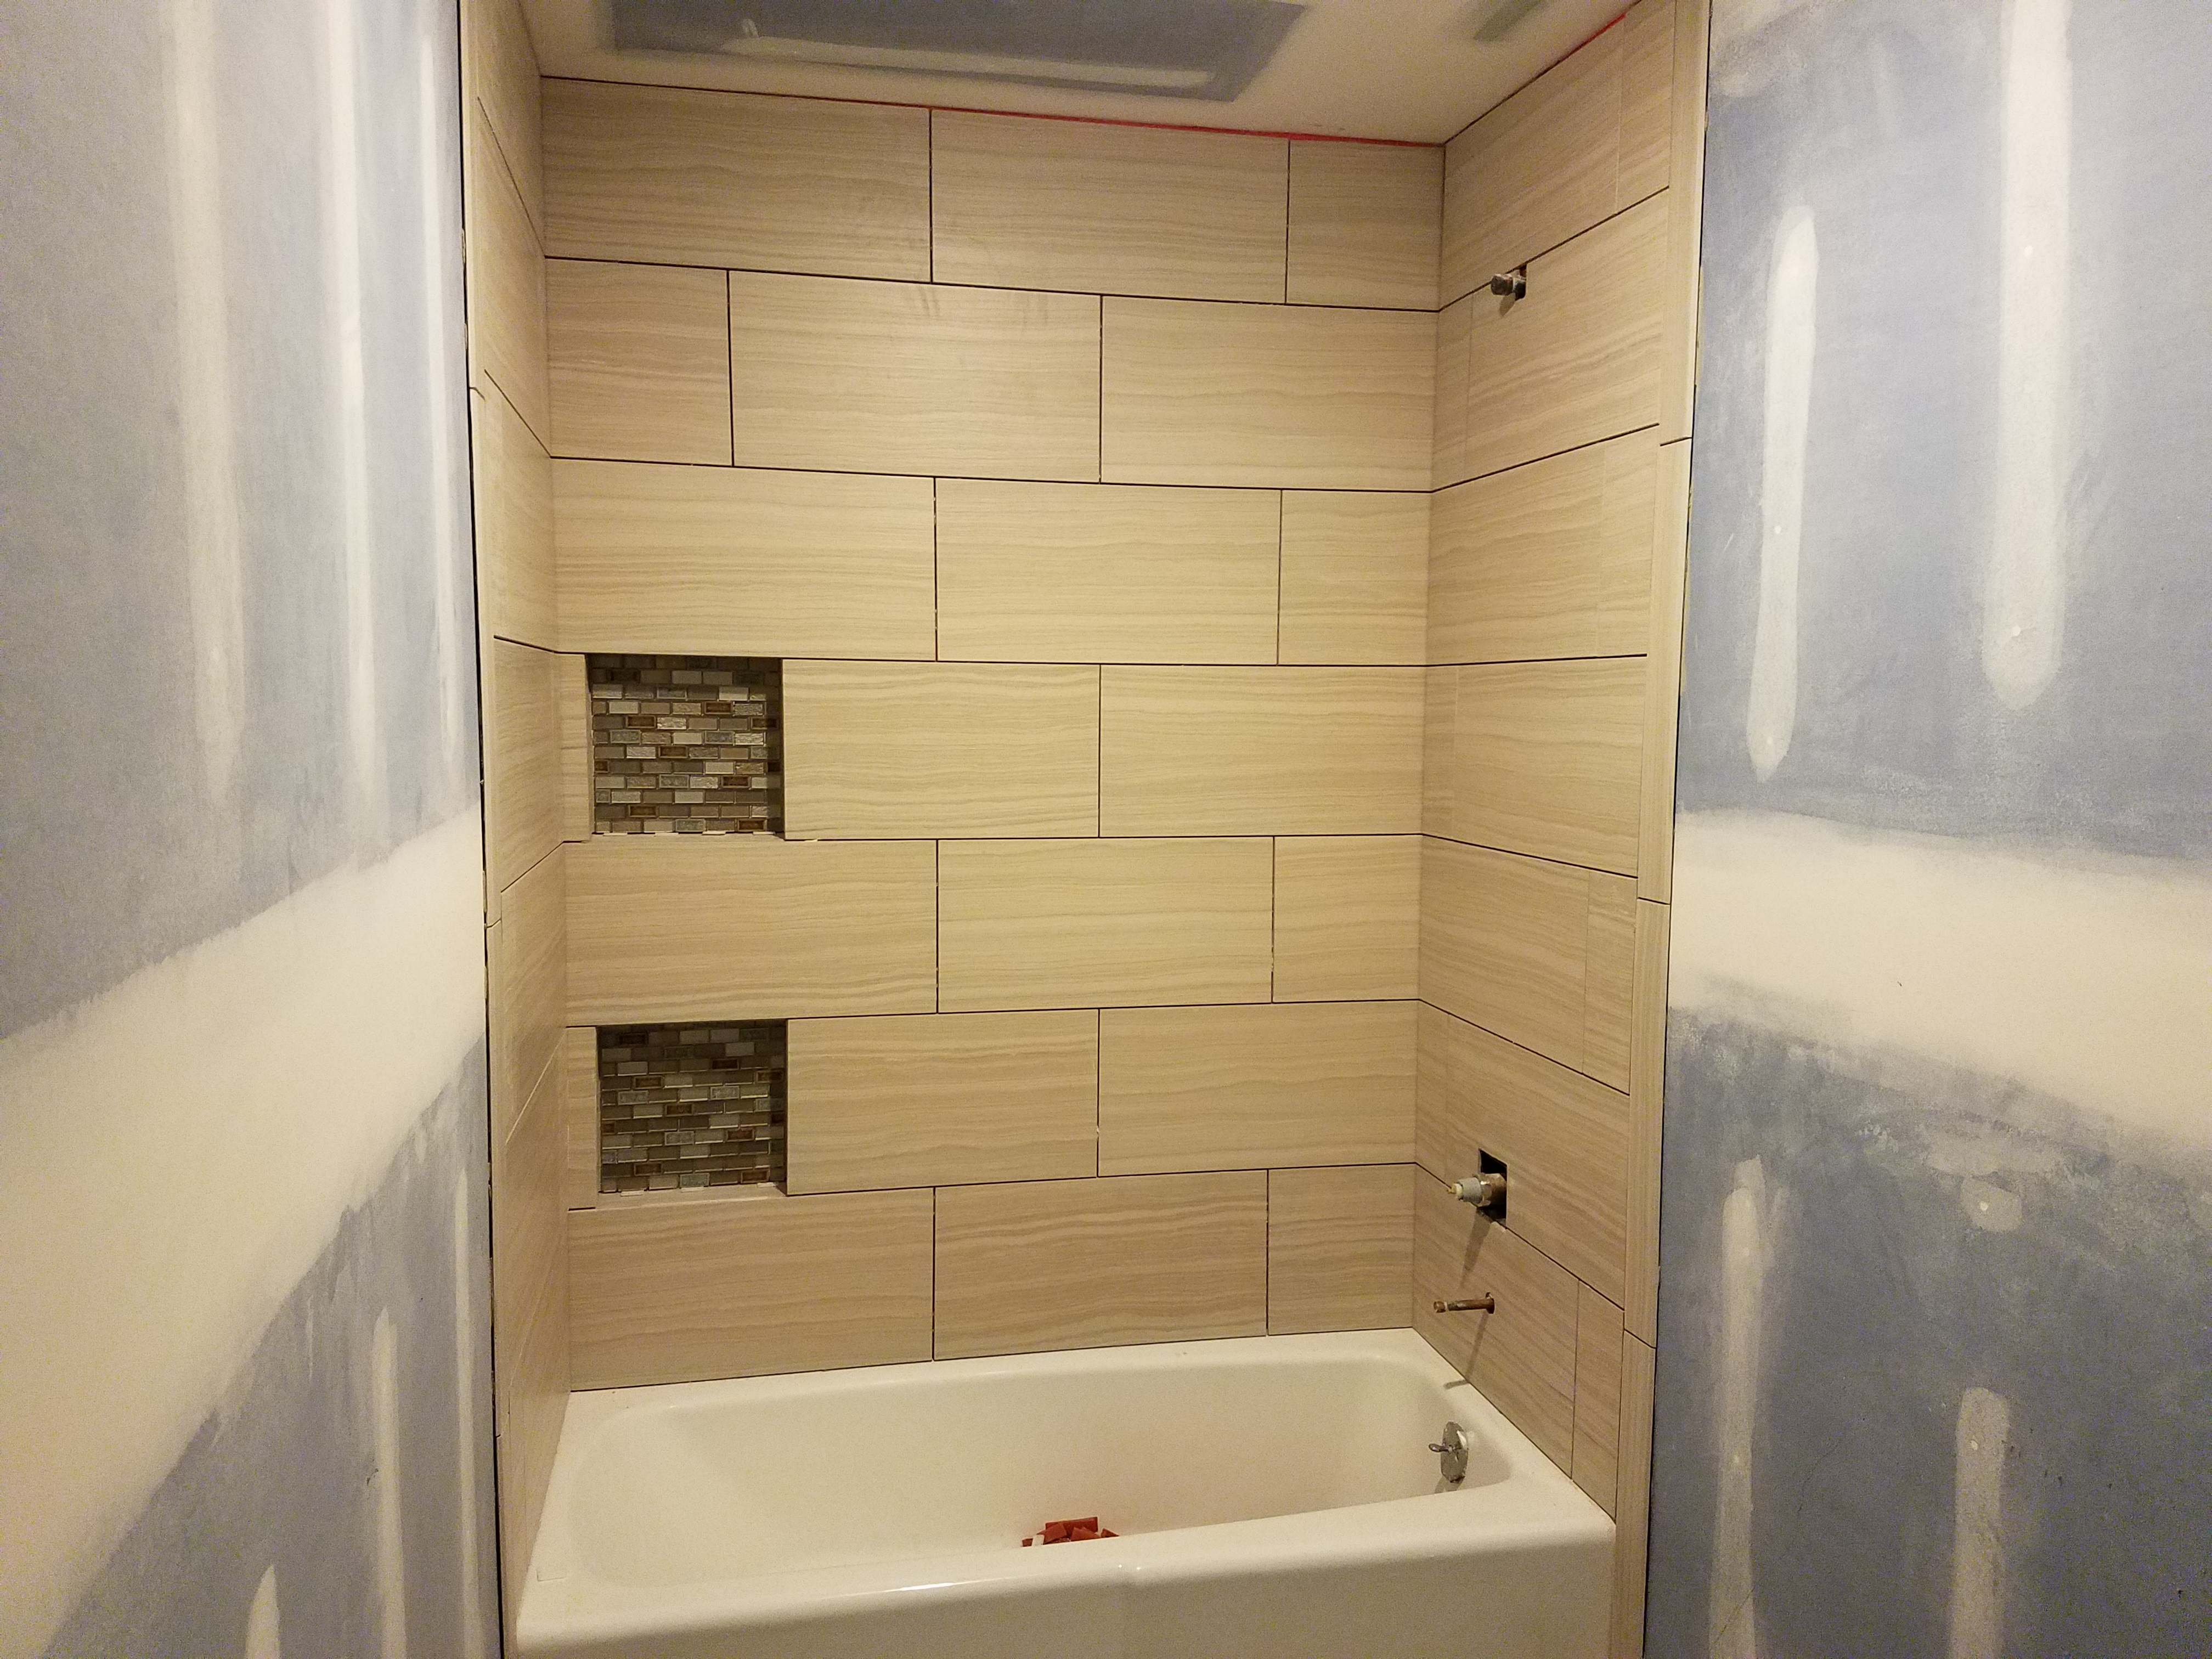 rolston bath 4